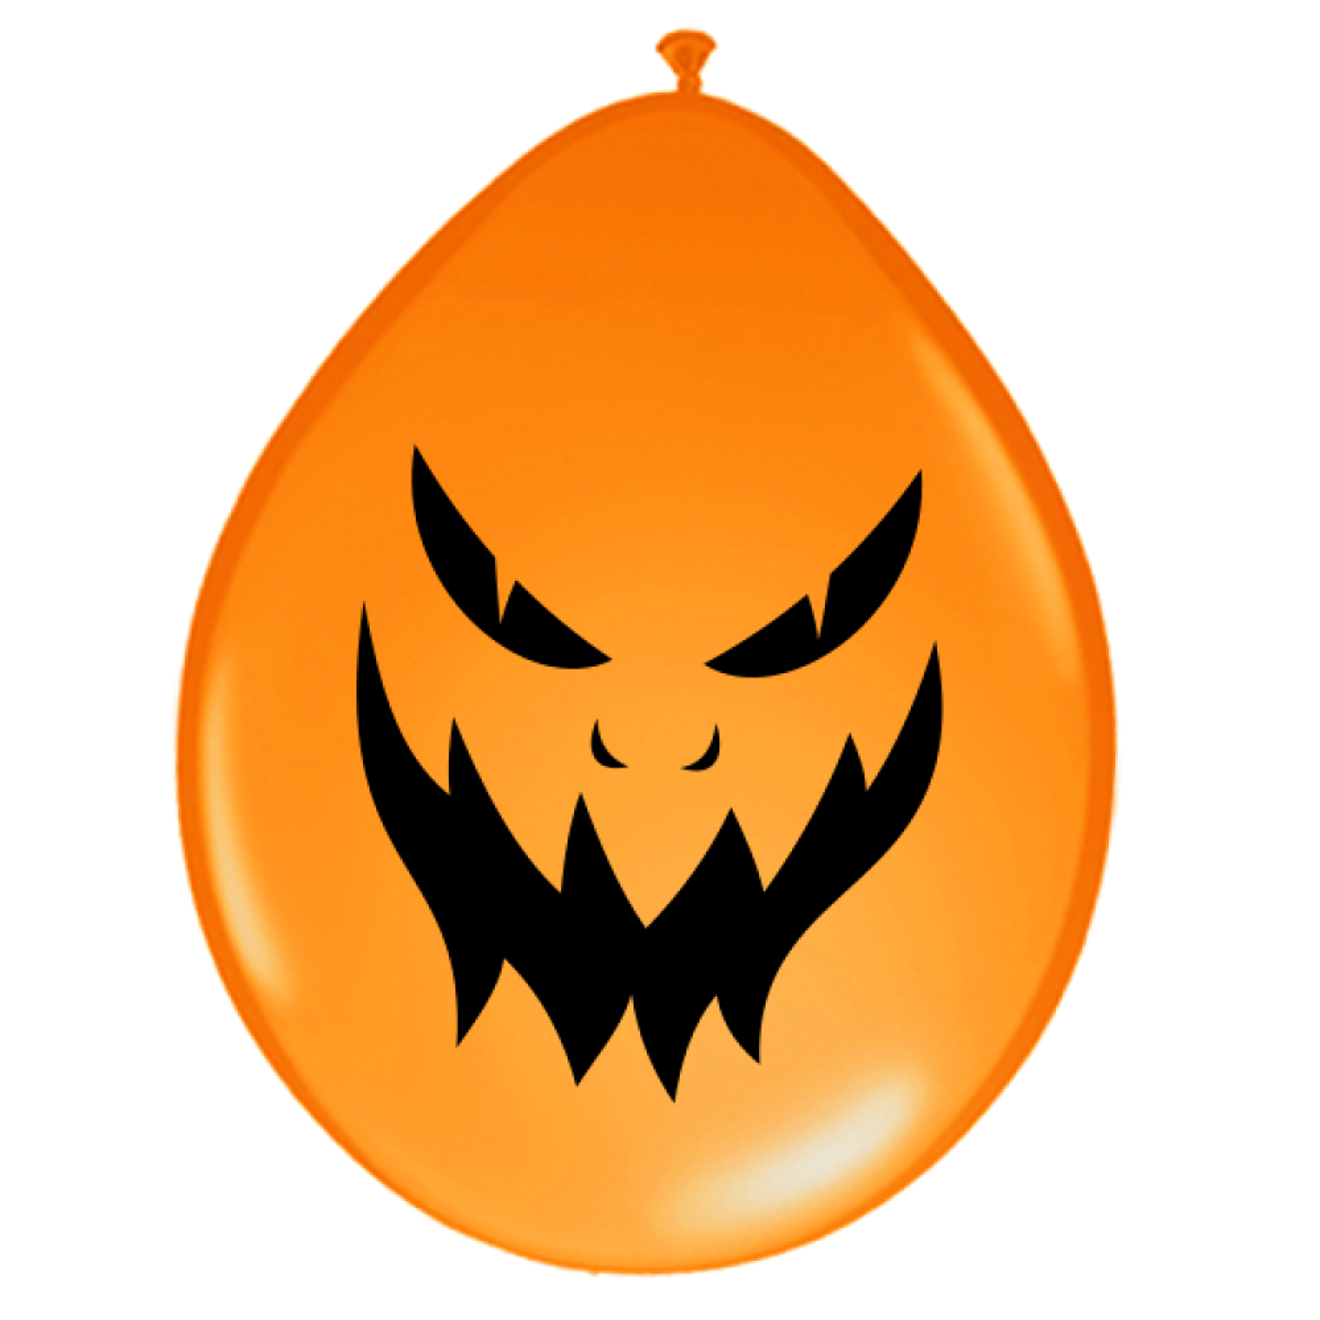 luftballons halloween b ses gesicht orange 30 cm. Black Bedroom Furniture Sets. Home Design Ideas